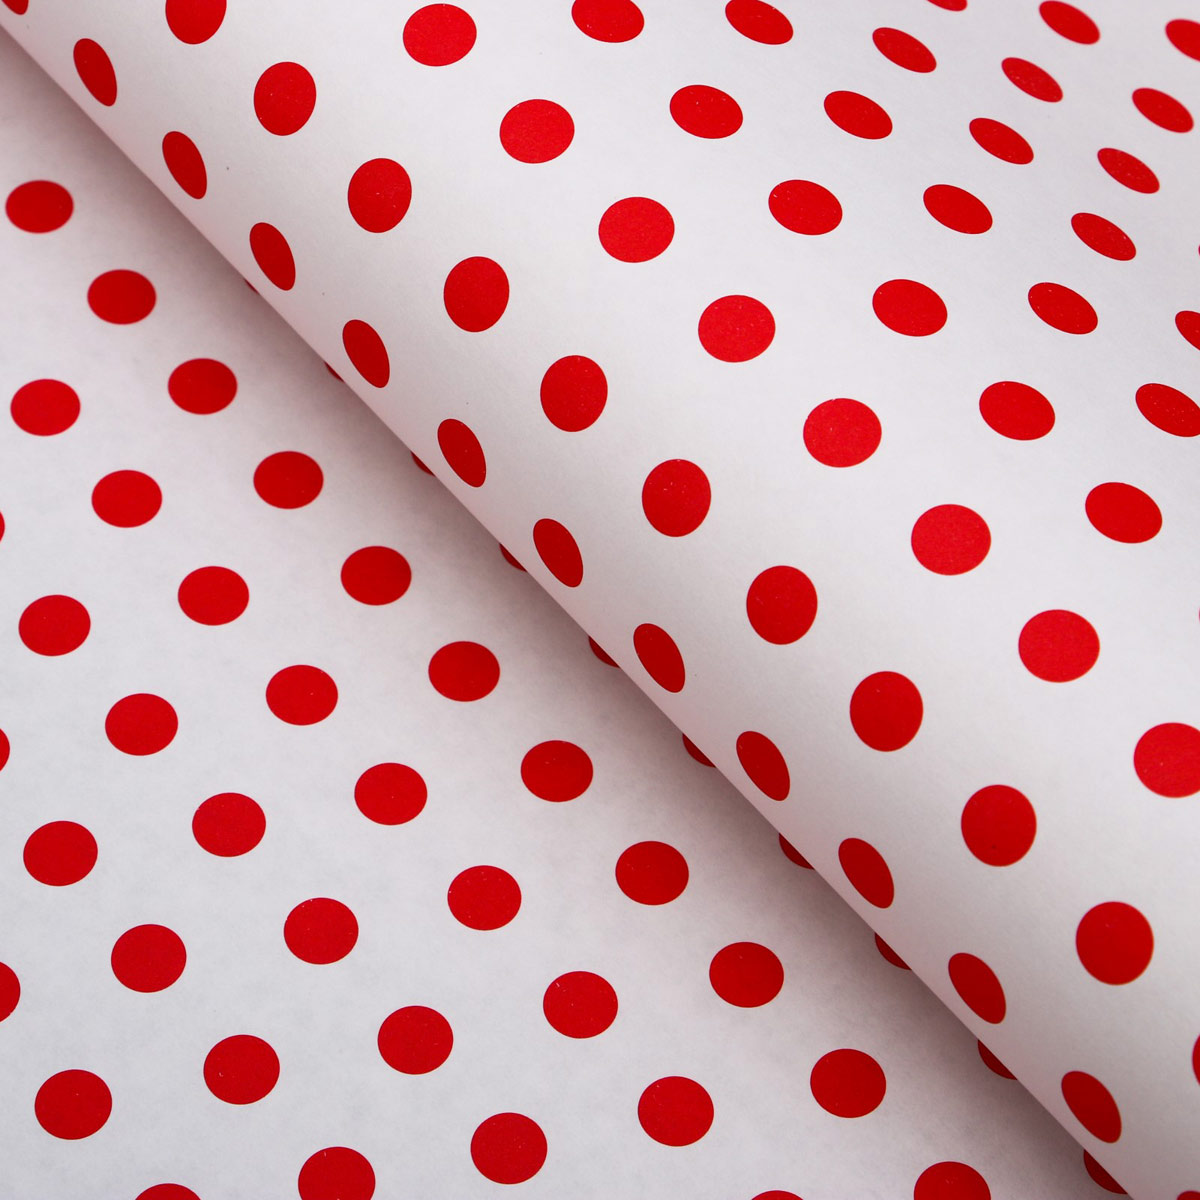 4878351 Бумага упаковочная, 'Горох крупный', крафт белый, красная, 50*70 см